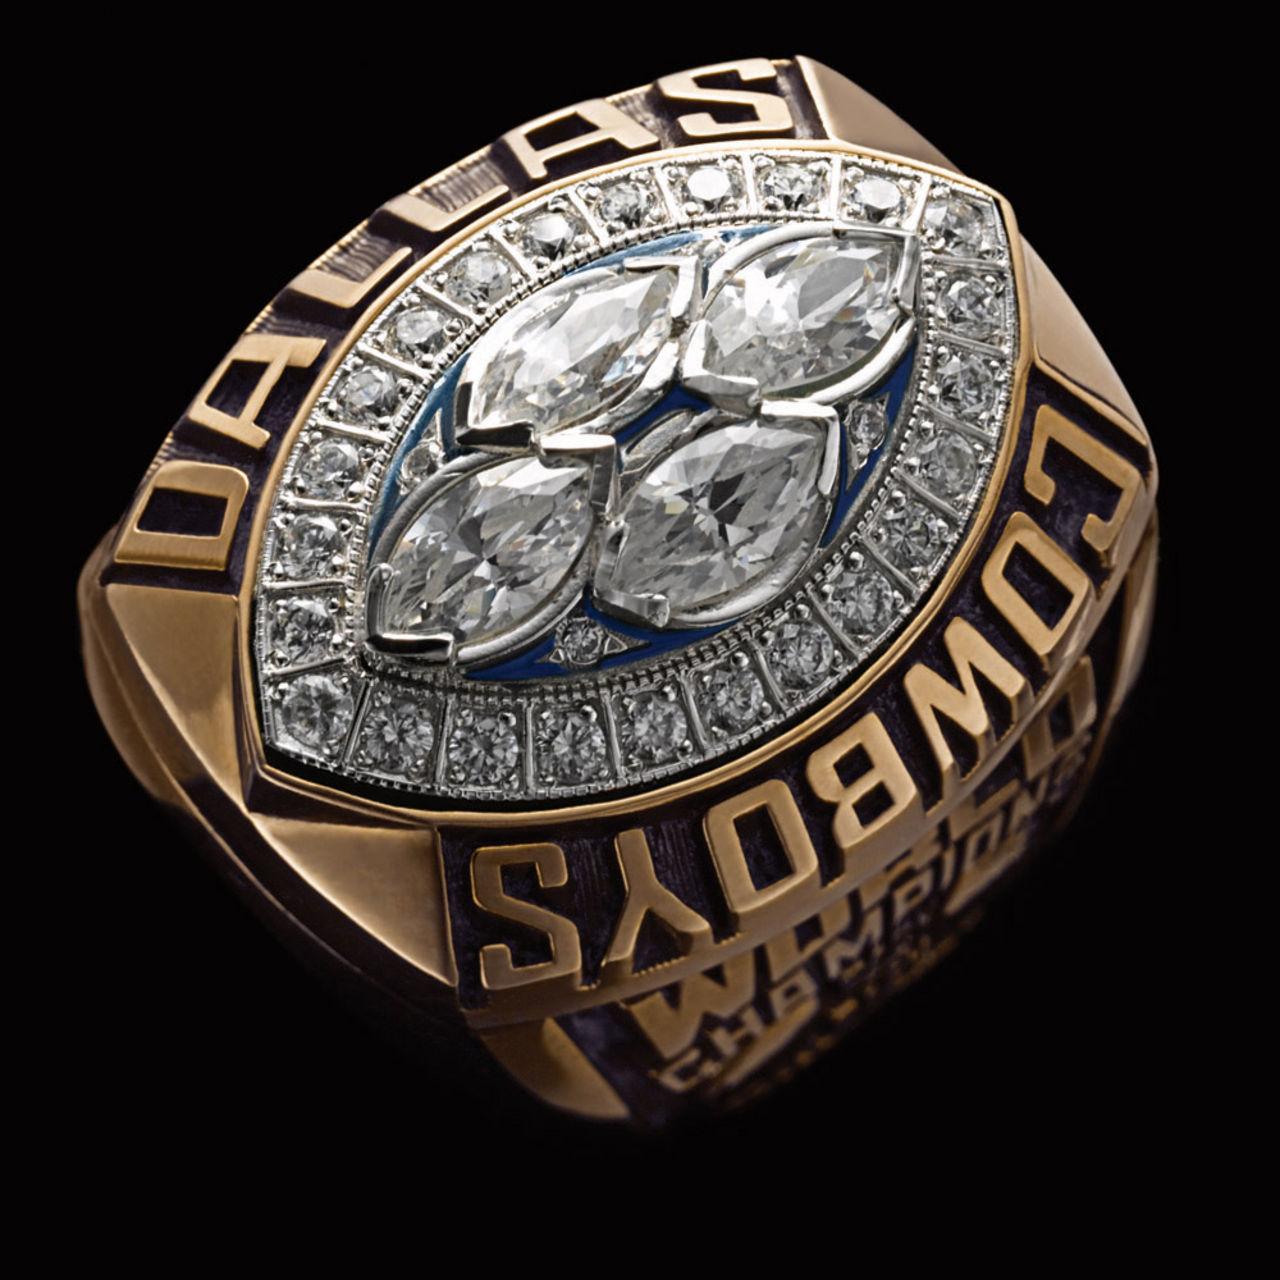 Dallas Cowboys 1994 champions ring